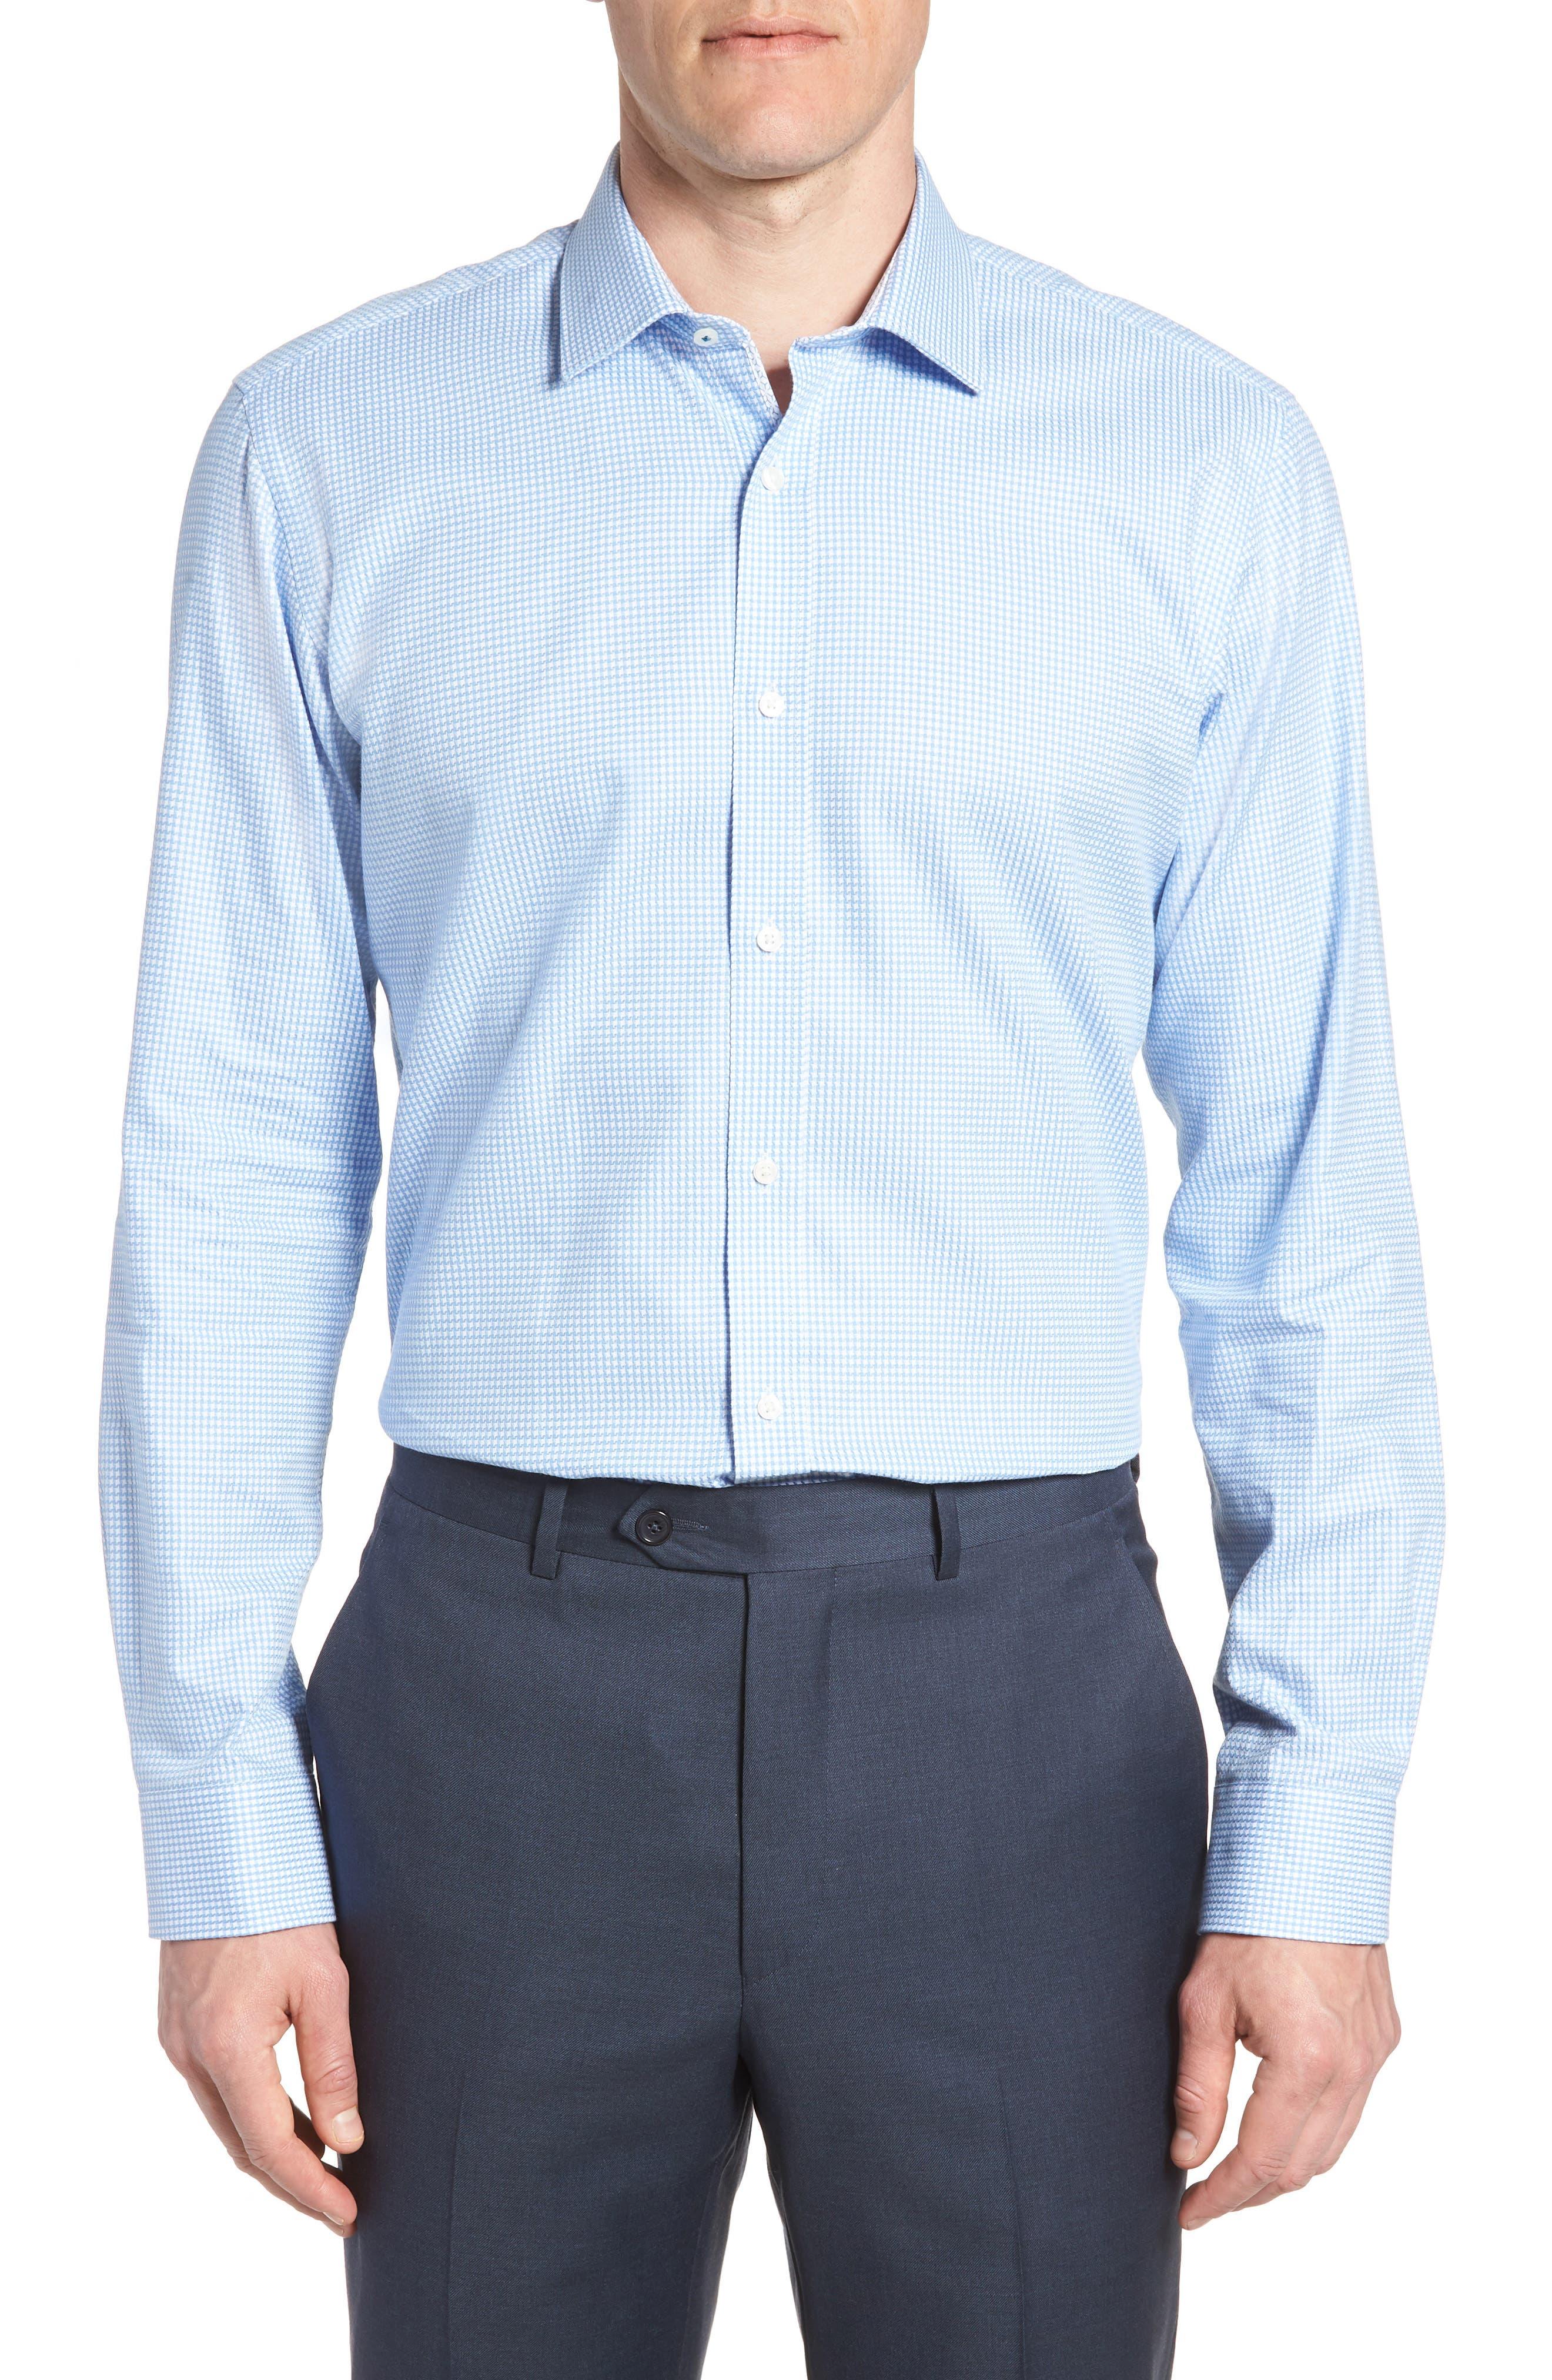 Jaiden Trim Fit Houndstooth Dress Shirt,                         Main,                         color, 450